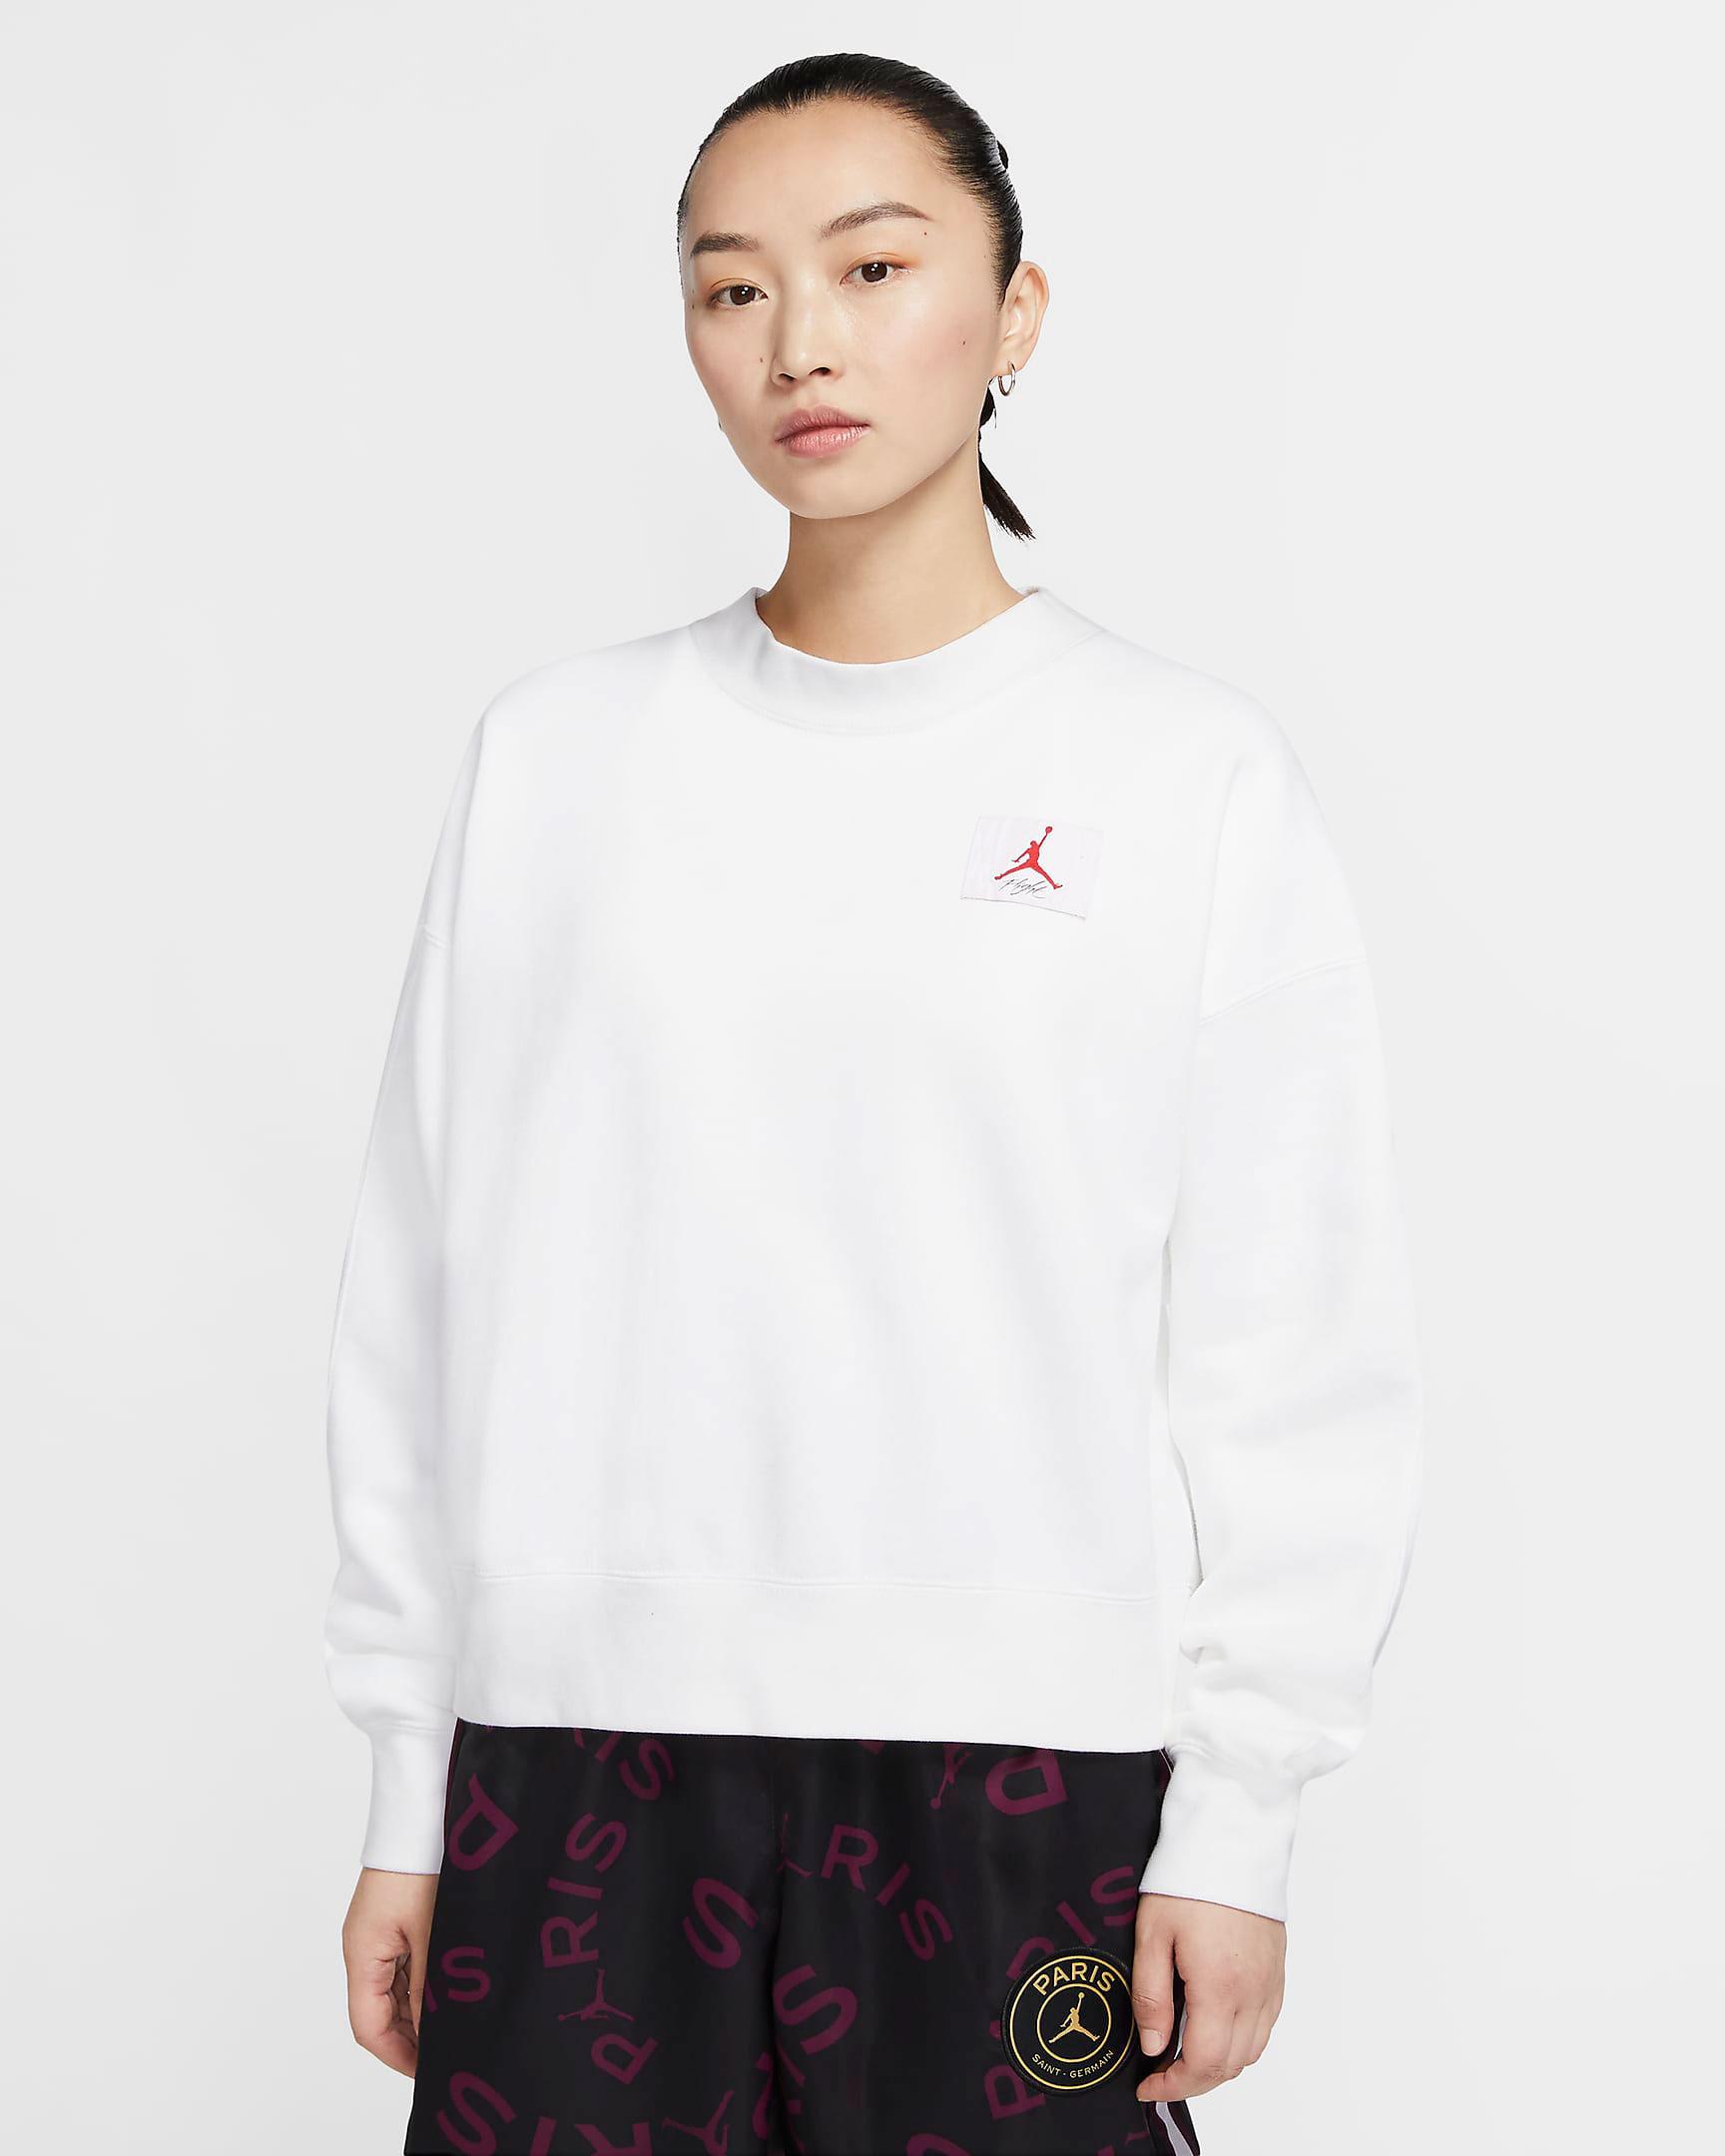 jordan-womens-flight-sweatshirt-white